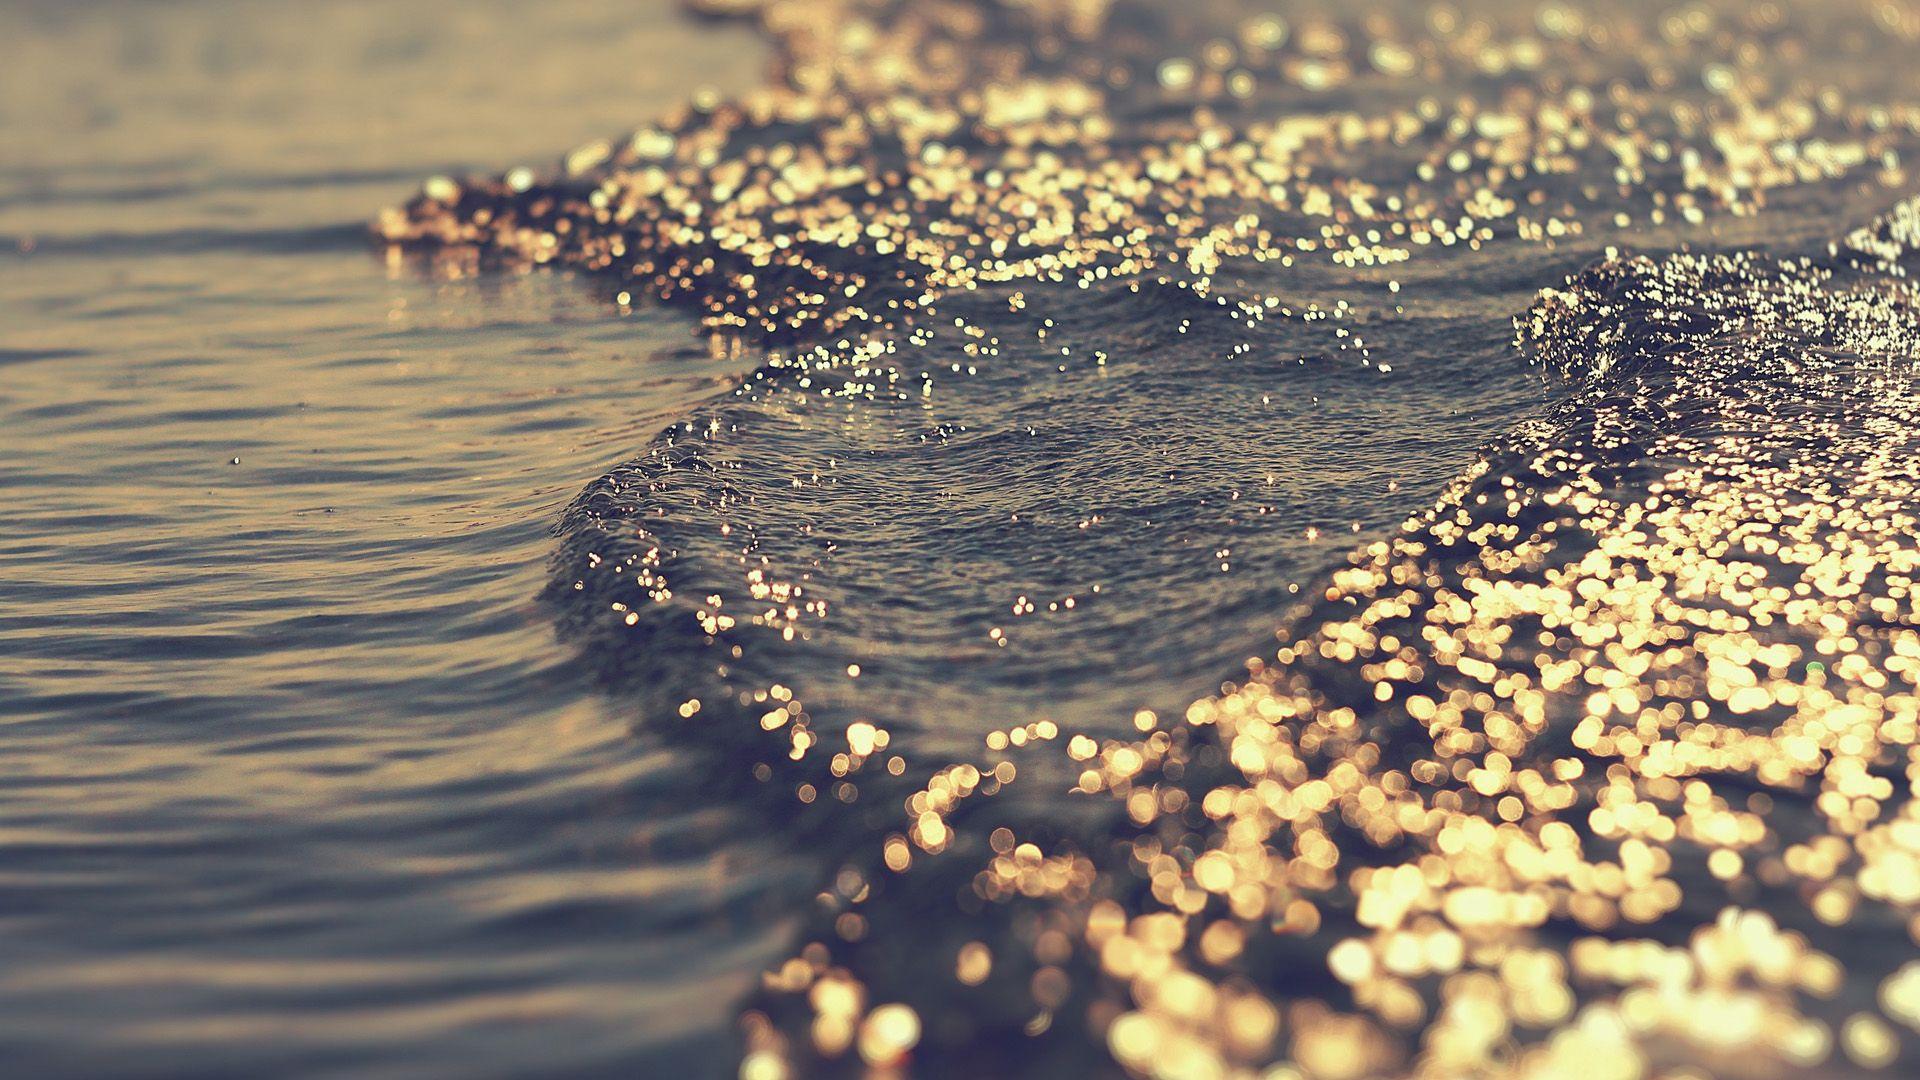 Hd wallpaper tumblr - Beautiful Water Line Hd Wallpaper